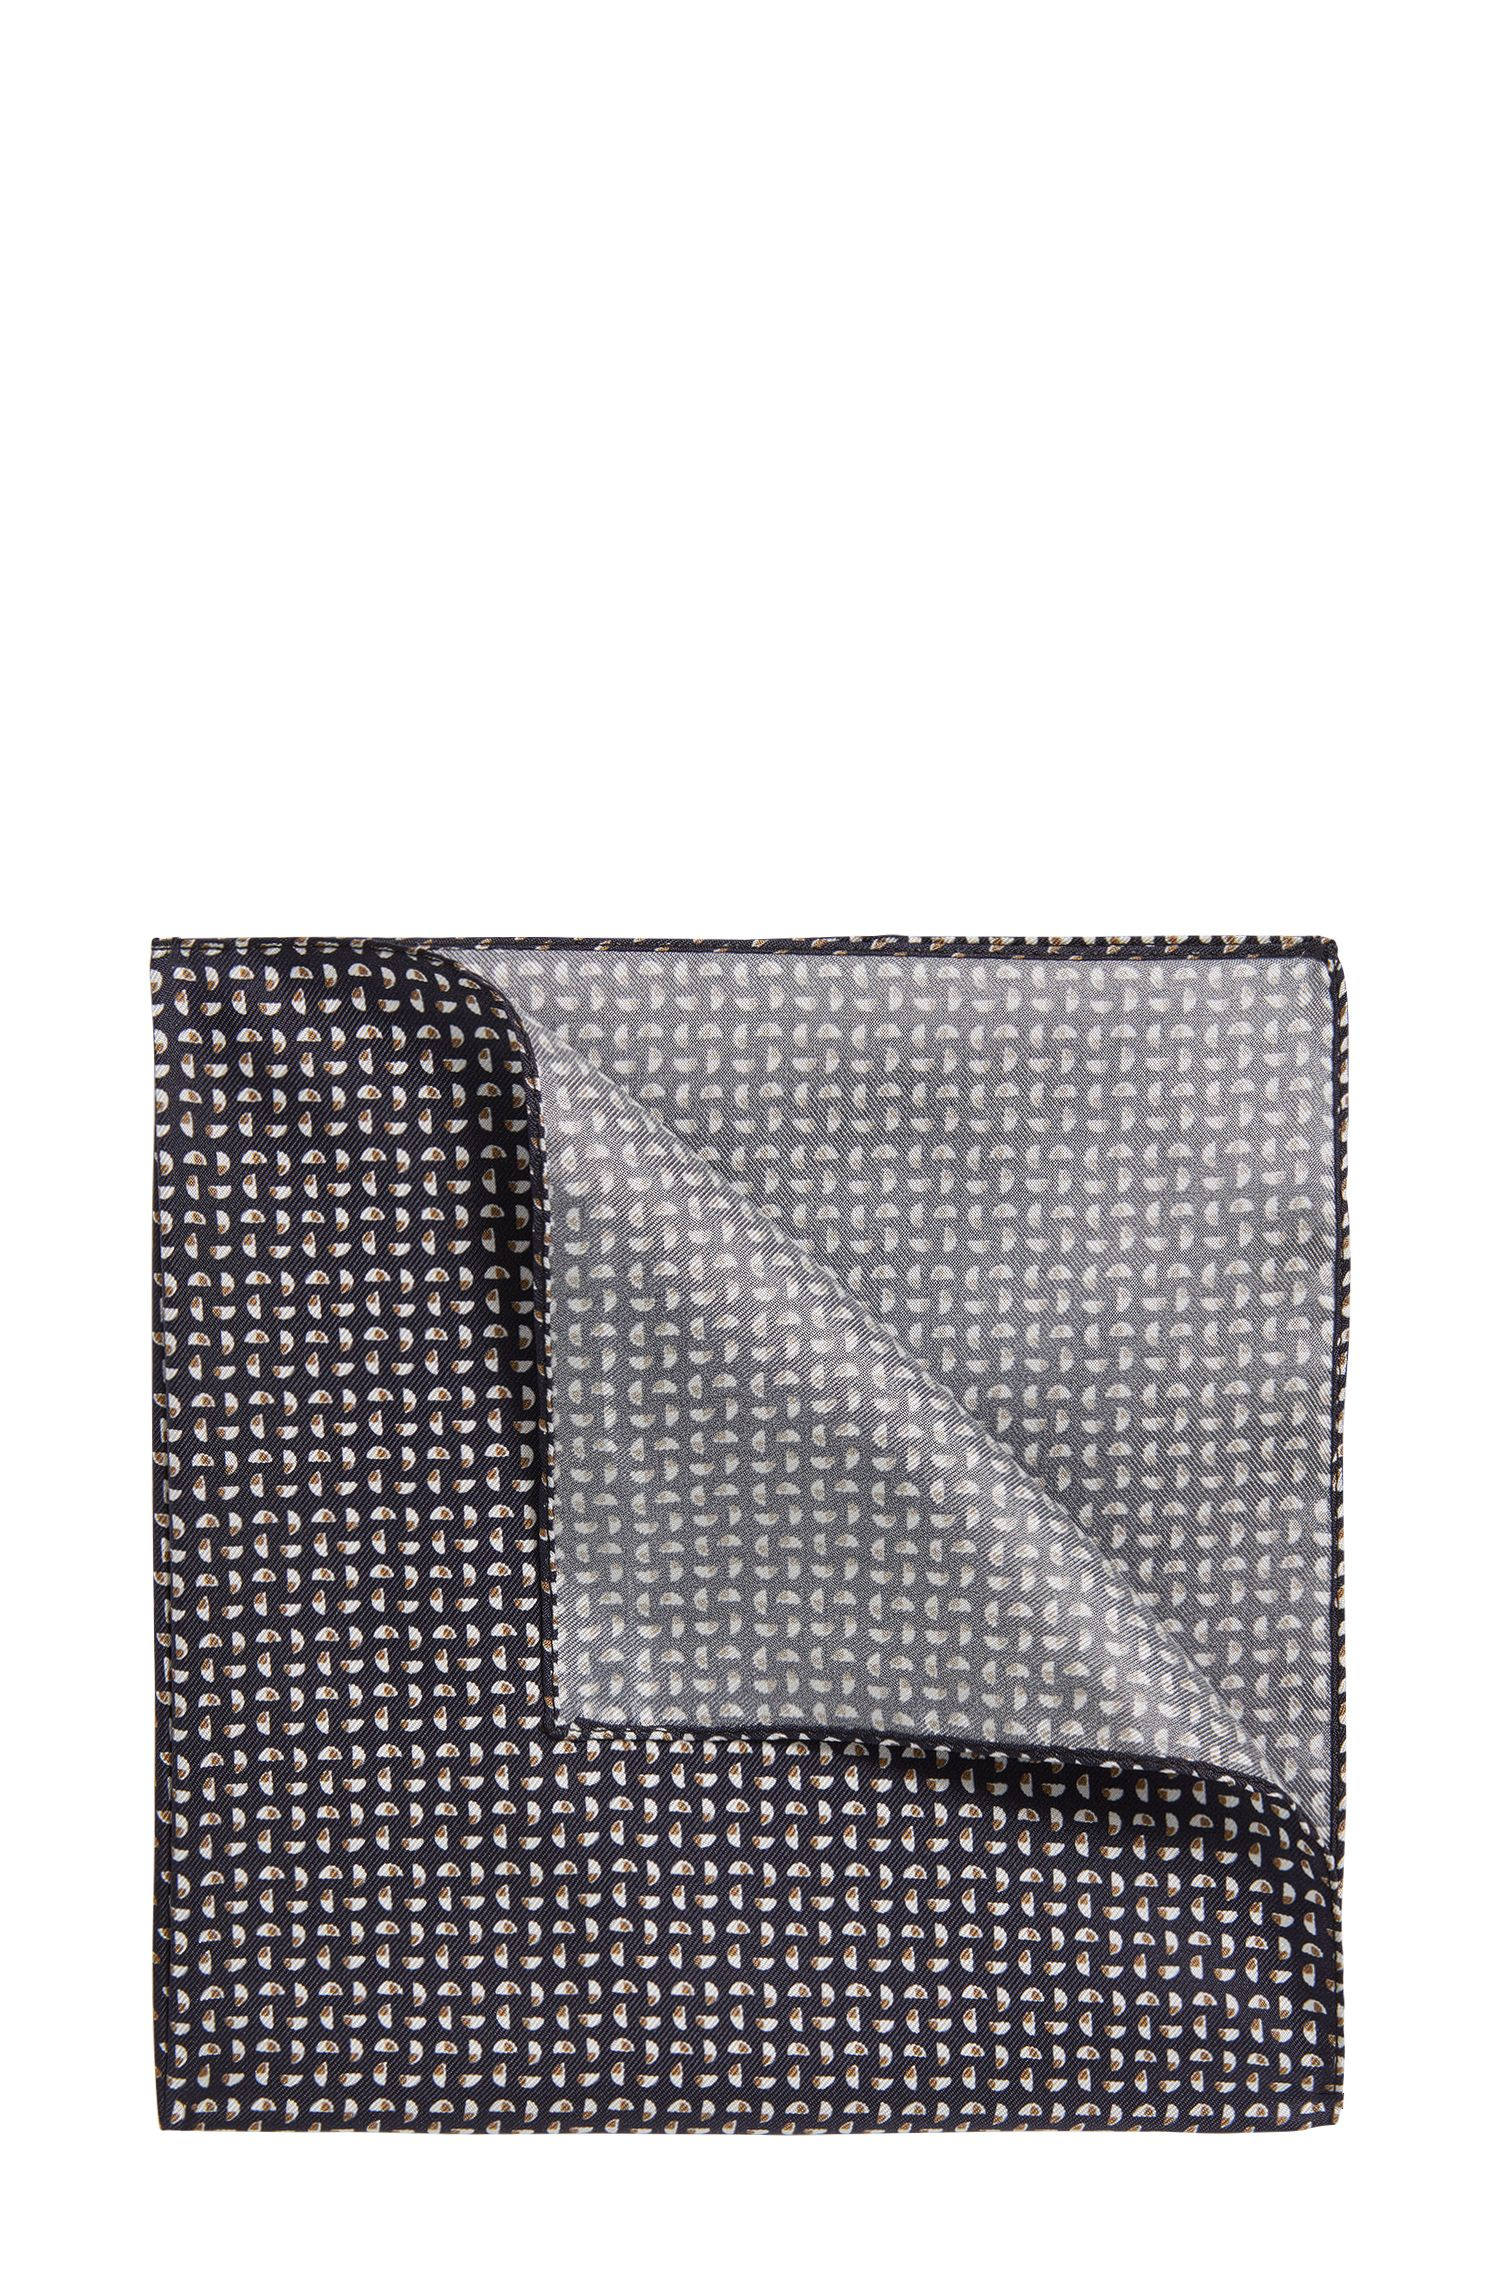 Patterened Italian Silk Pocket Square | Pocket sq. cm 33x33